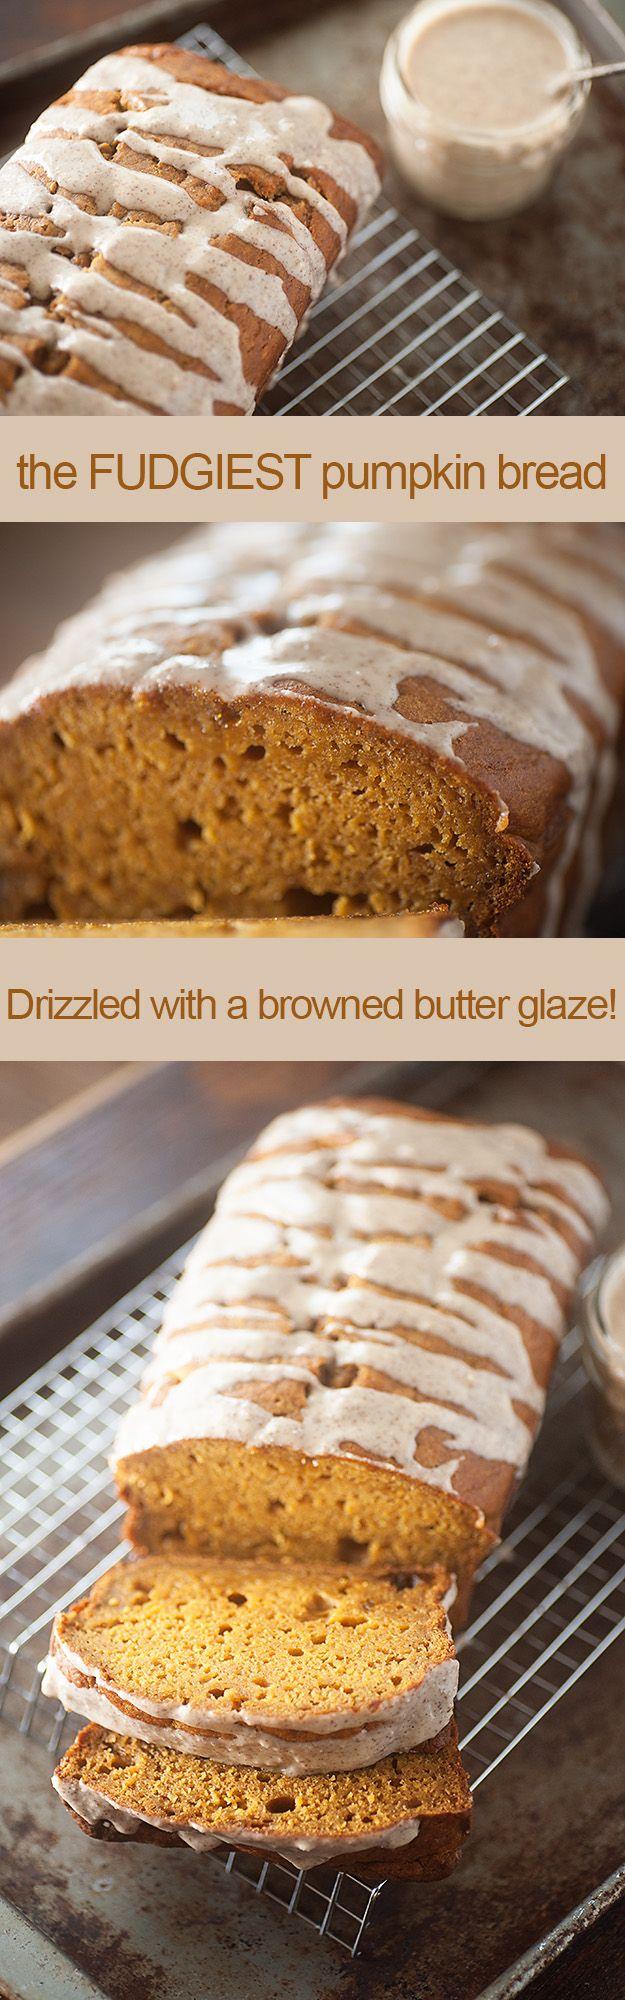 Super moist and fudgy pumpkin bread recipe!